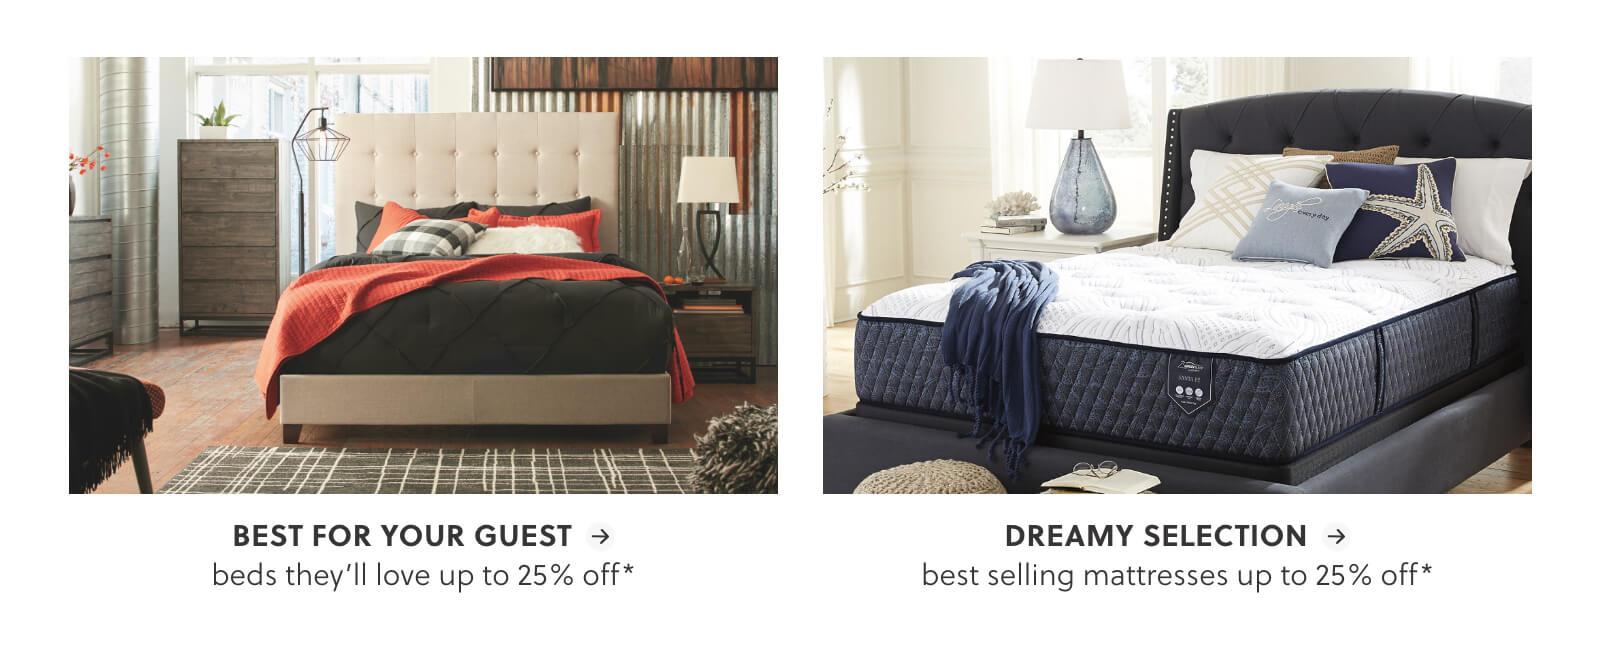 Guest Bedroom Beds, Best Selling Mattresses